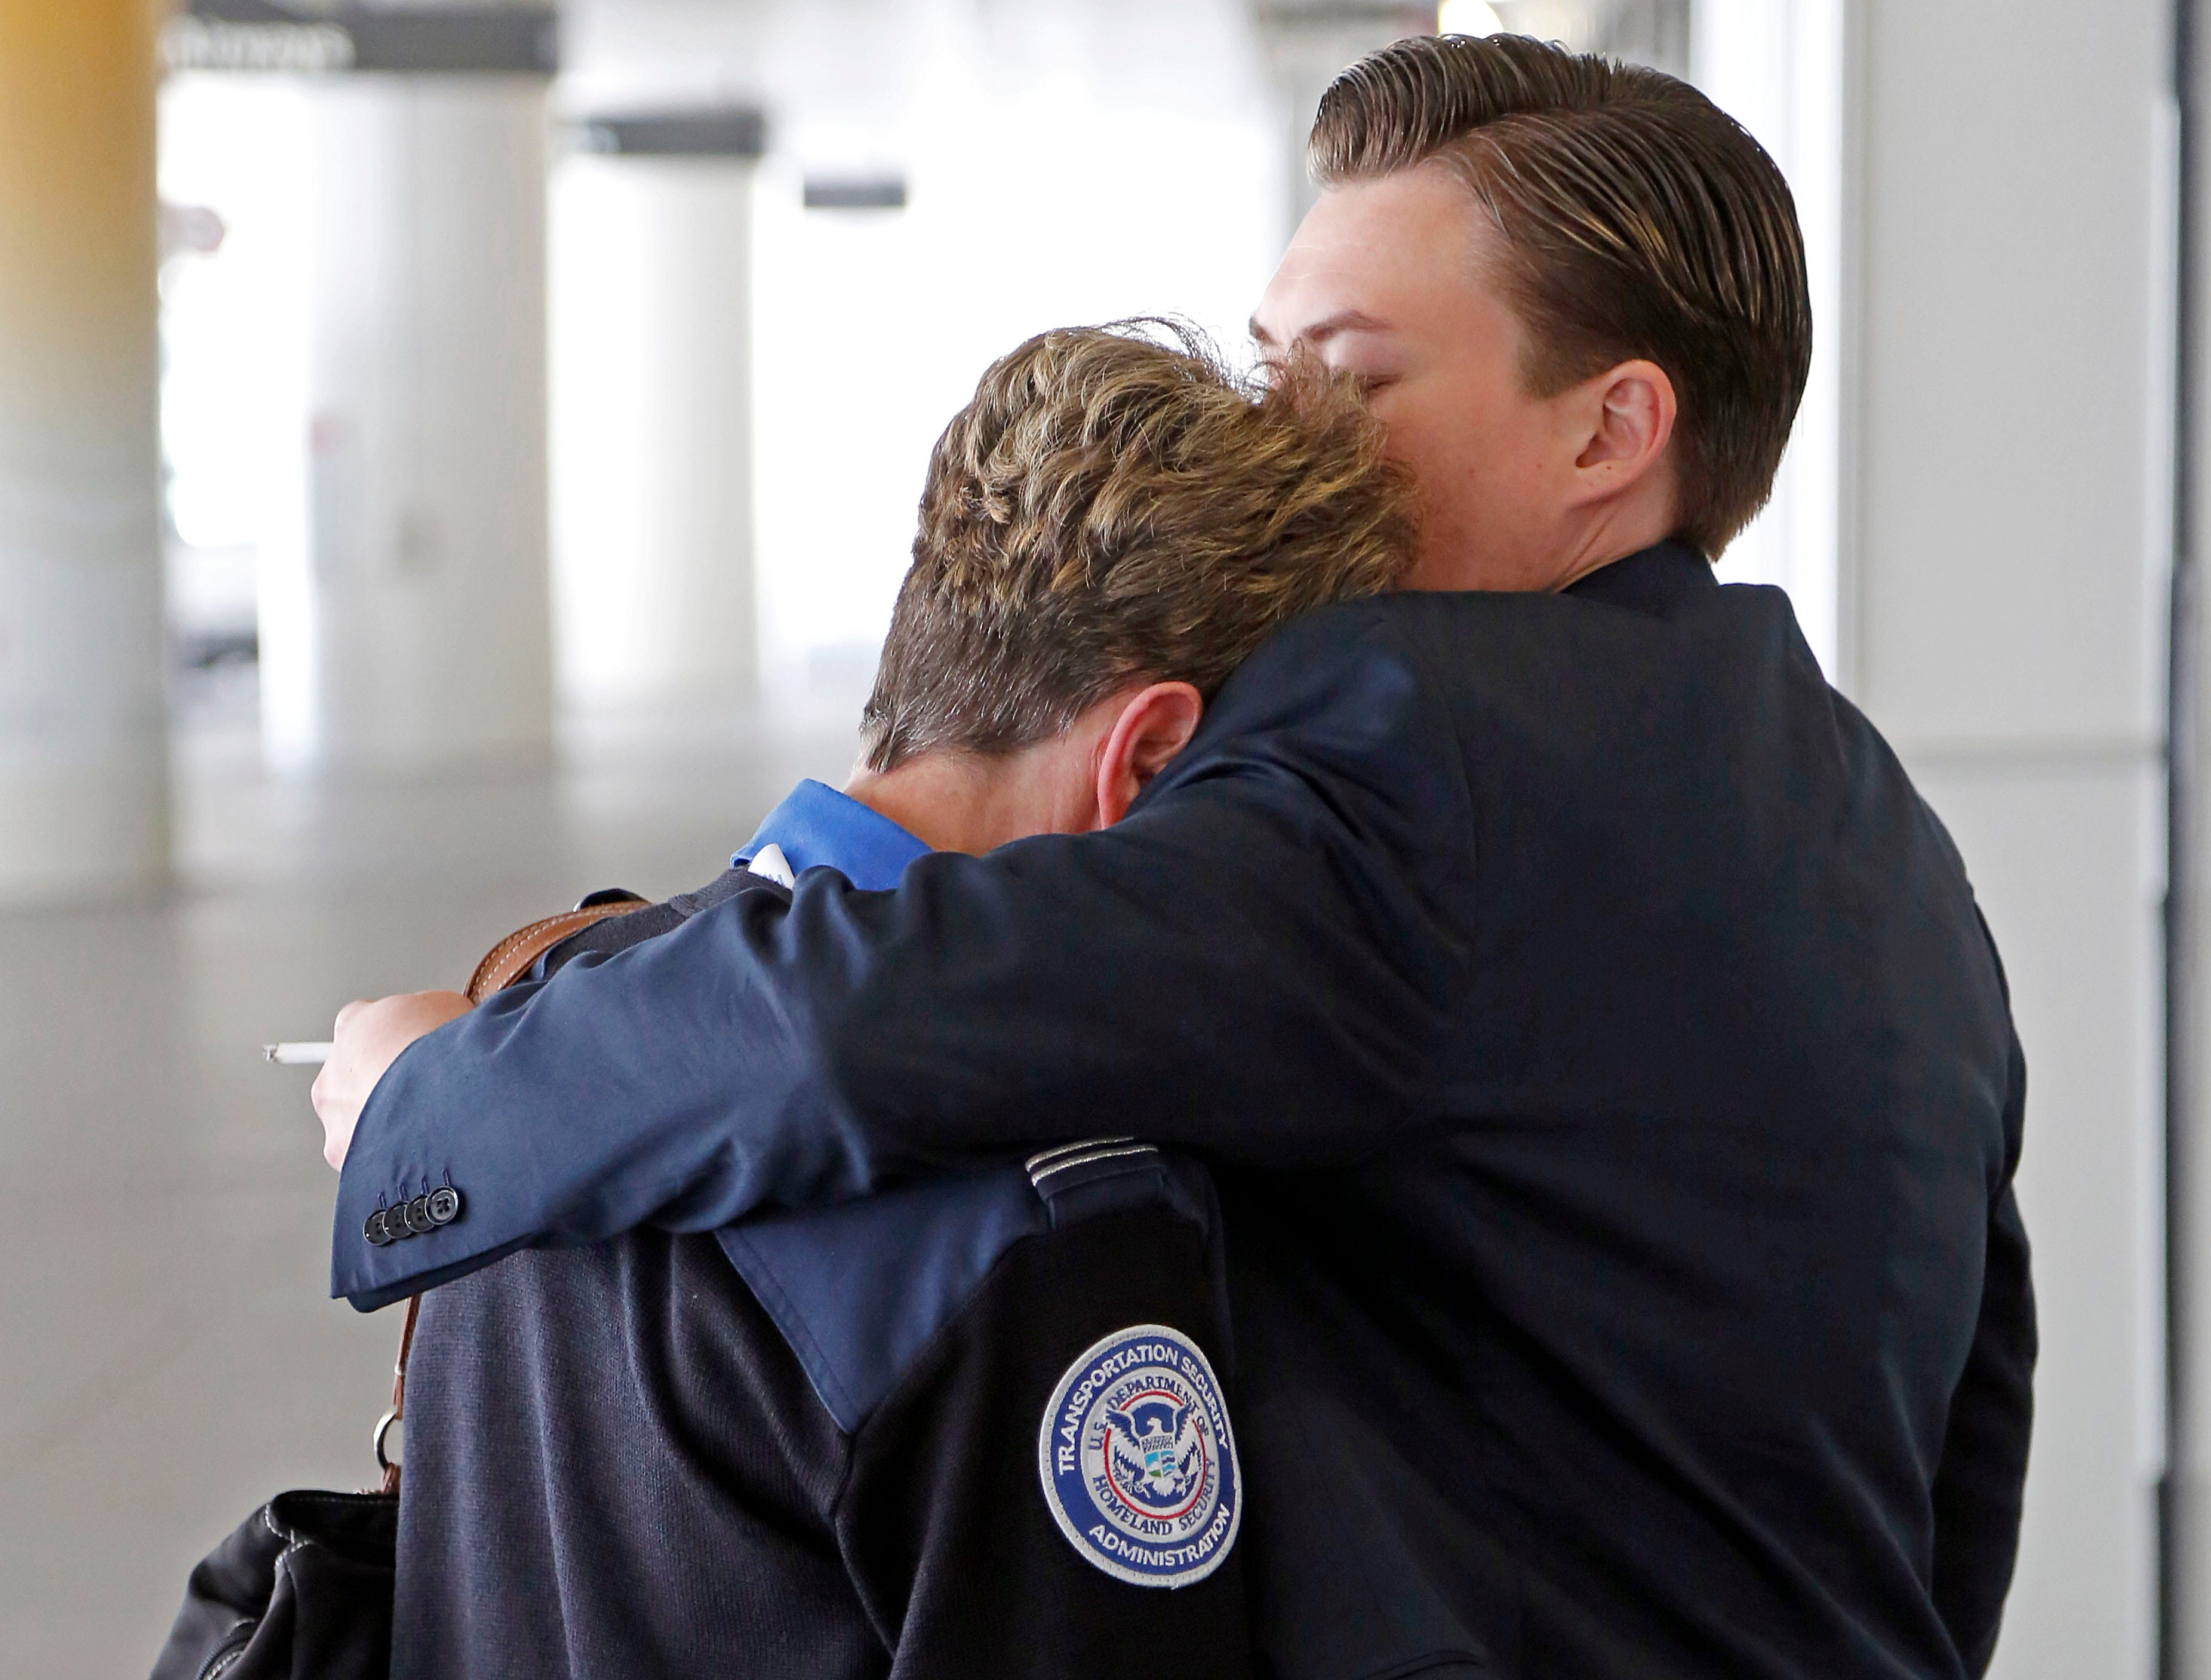 TSA agent gunned down at LAX